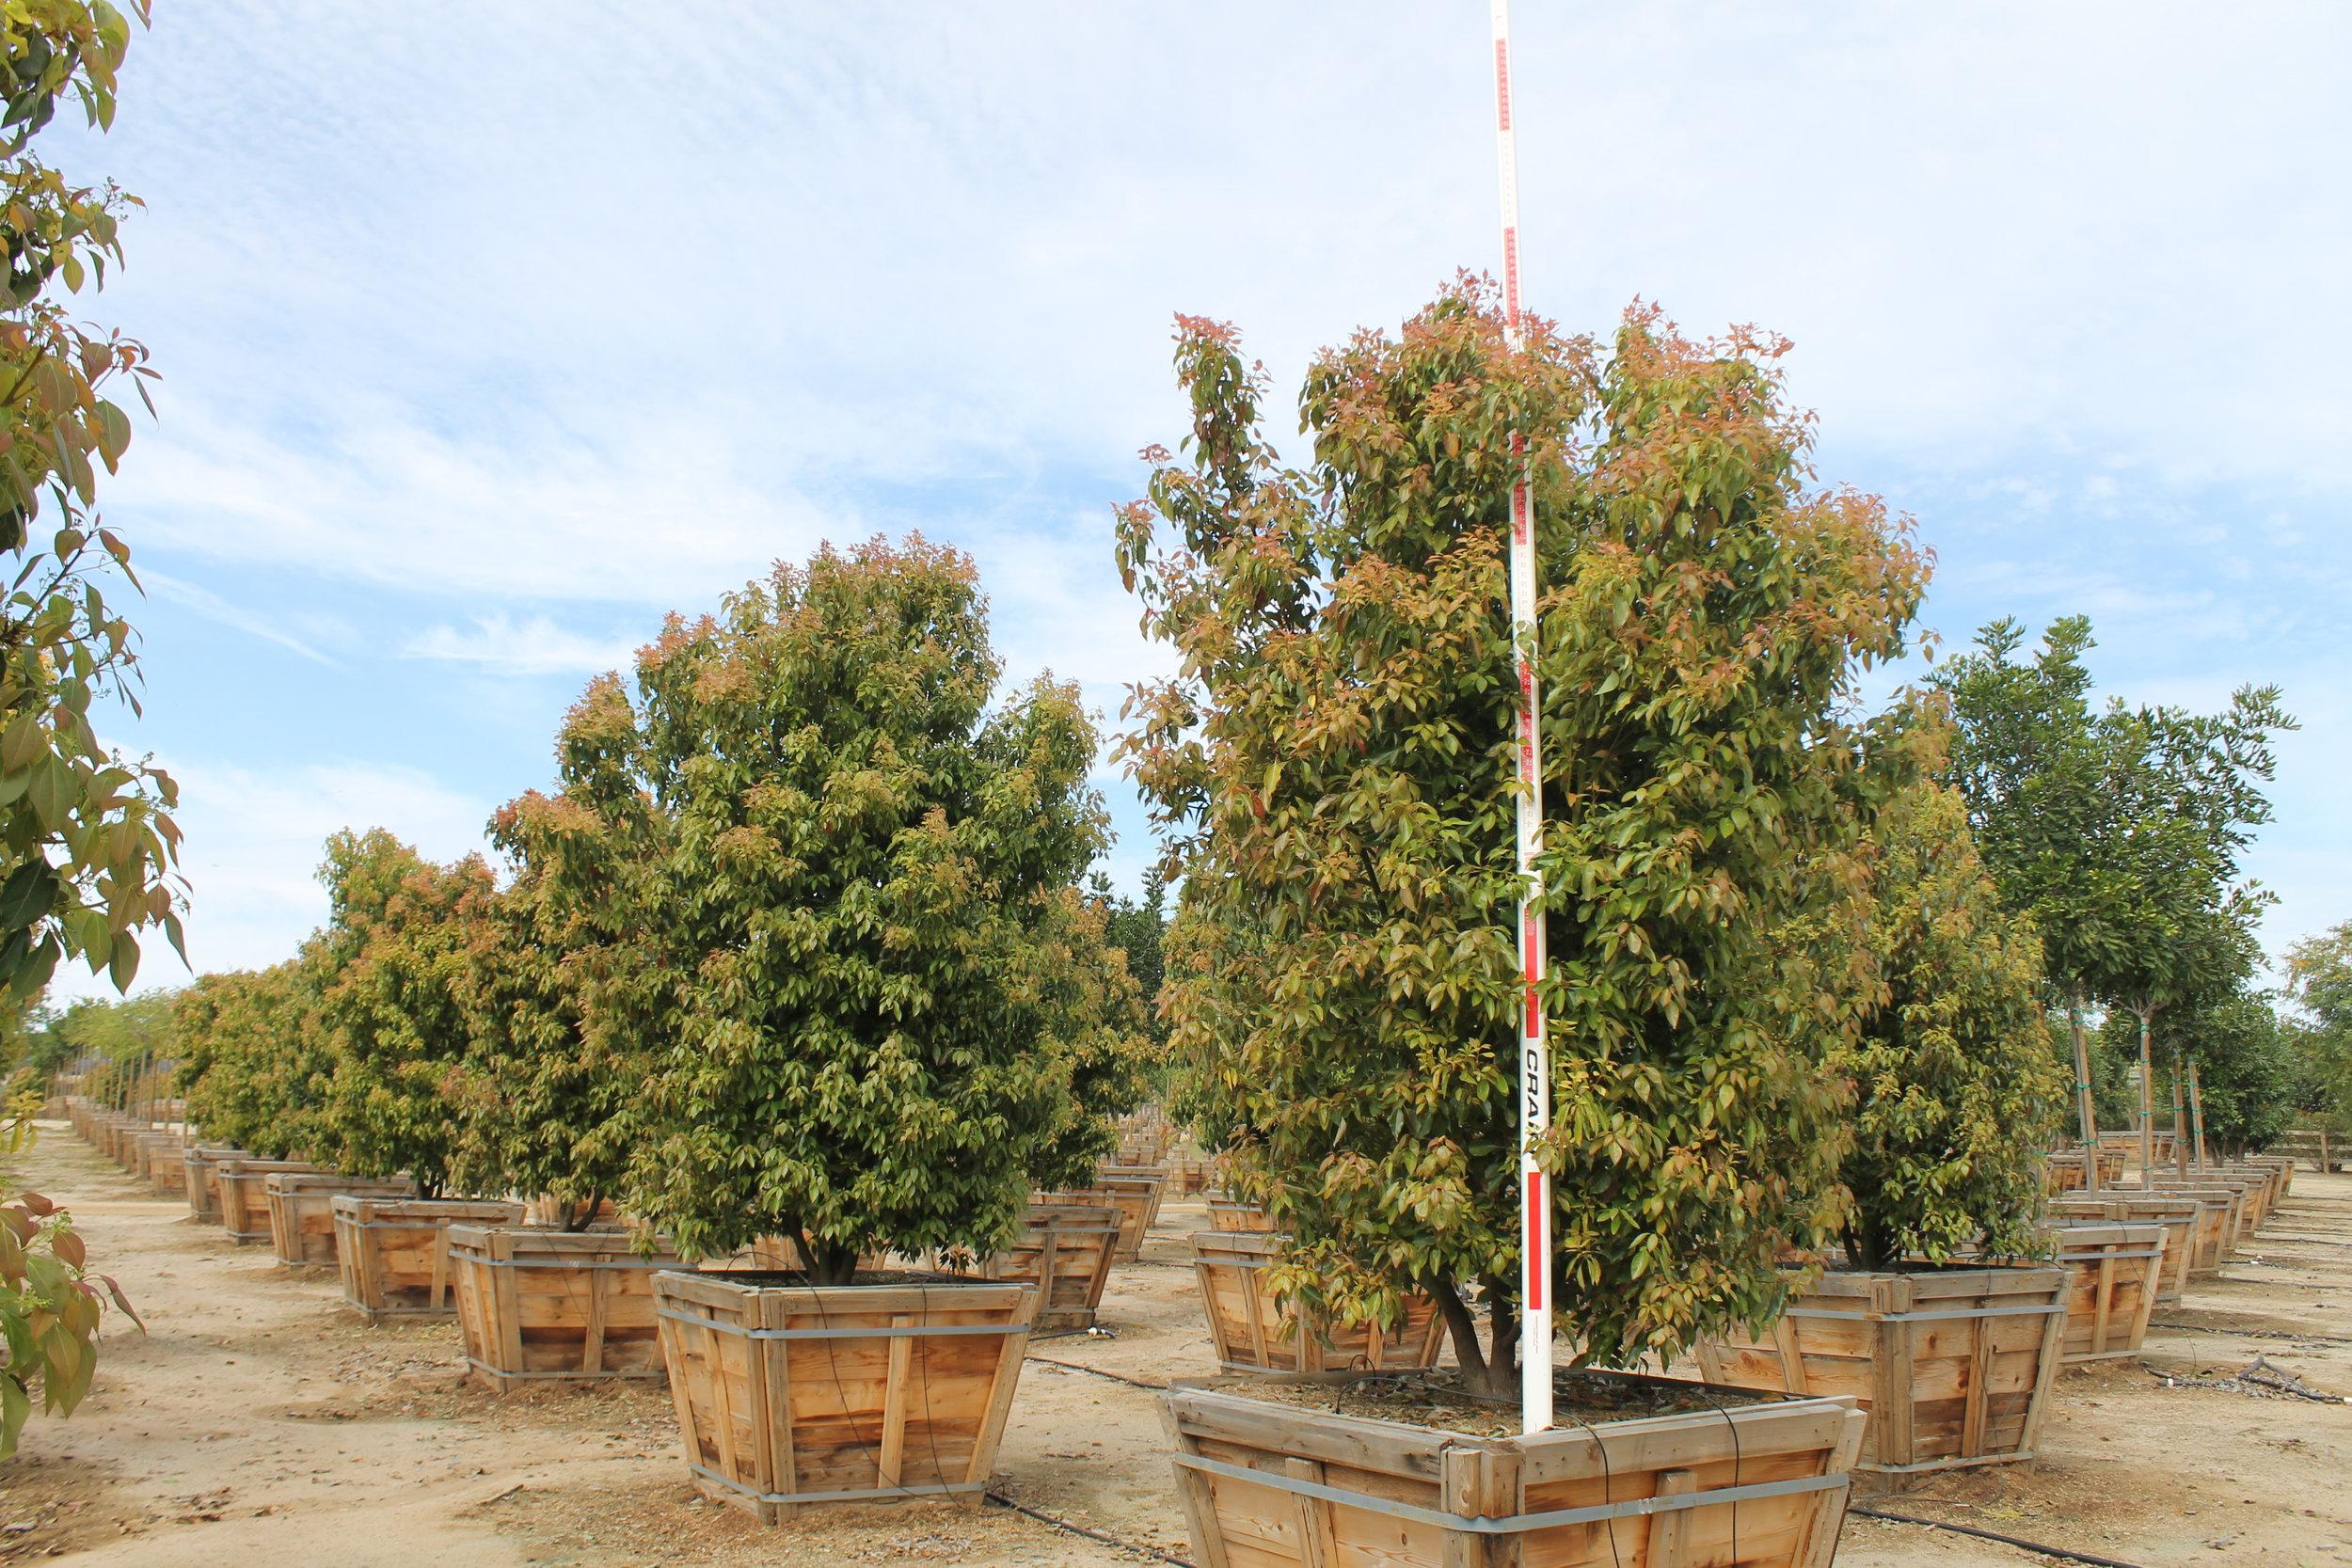 Cinnamomum camphora multi - 48 box - 8-10 ft x 6-7 ft